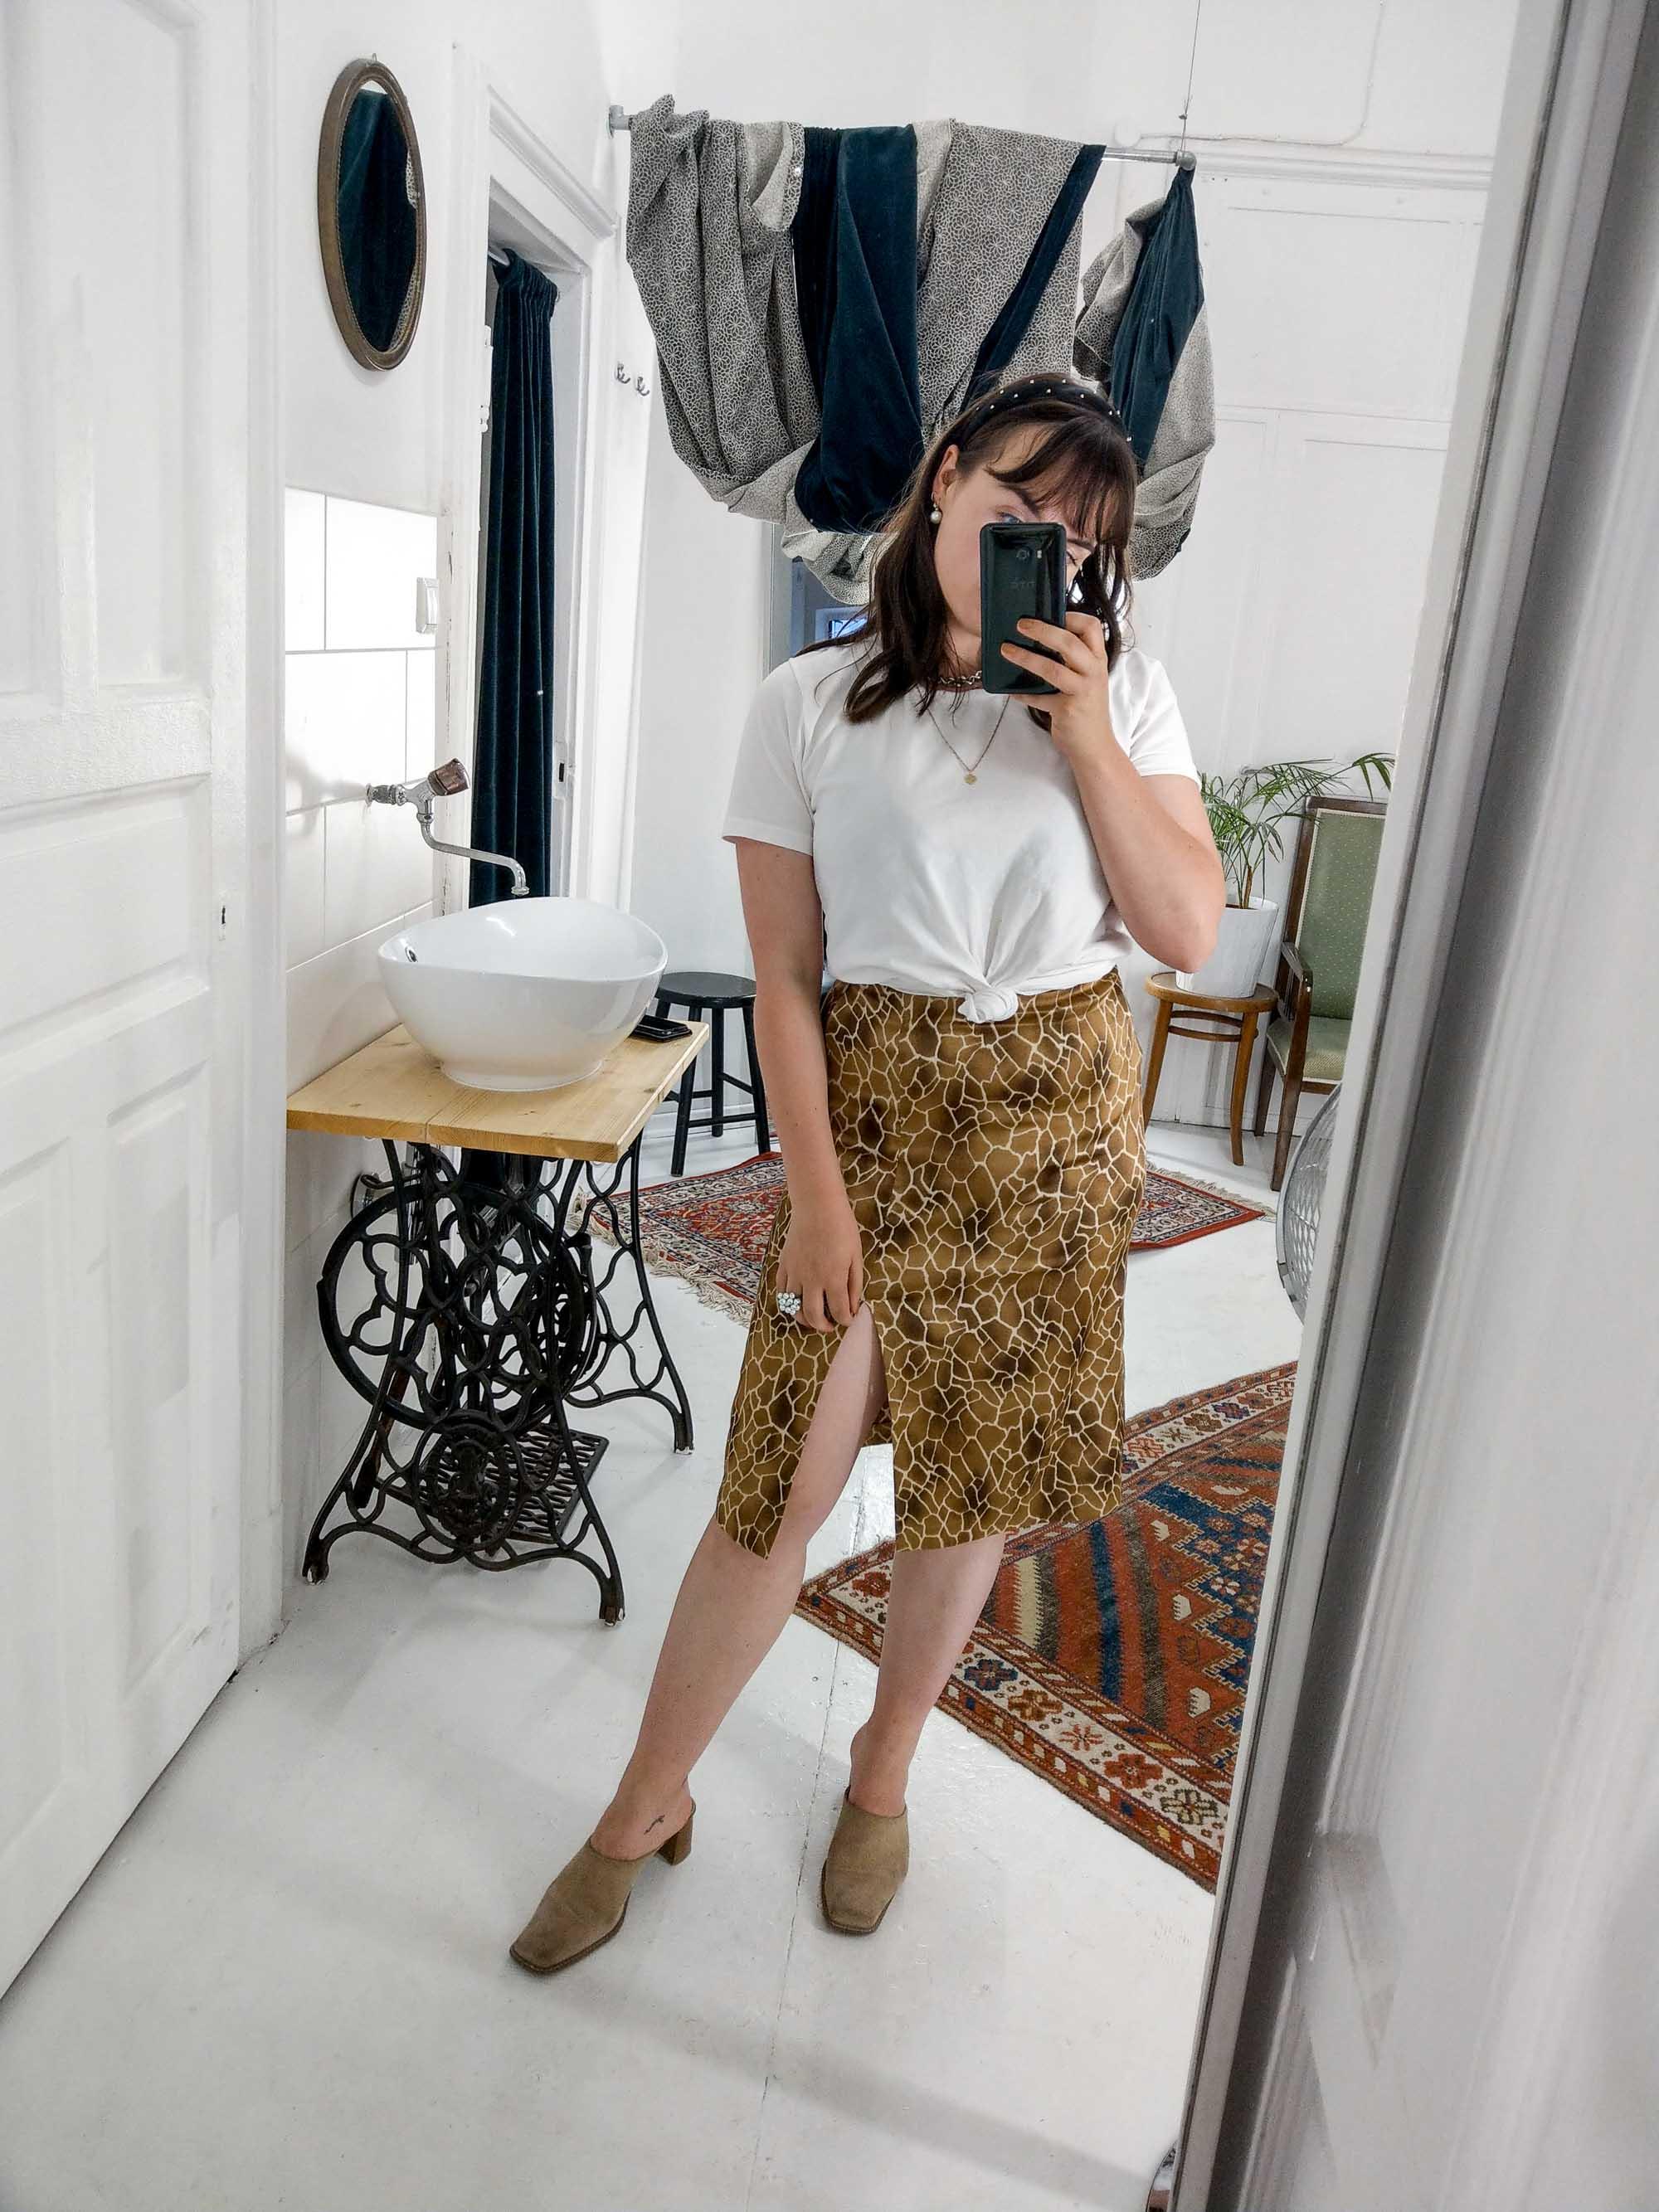 Clarissas Office Looks im Juli – Vintage Outfit Inspiration mit Animal Print Rock und Basic T-Shirt